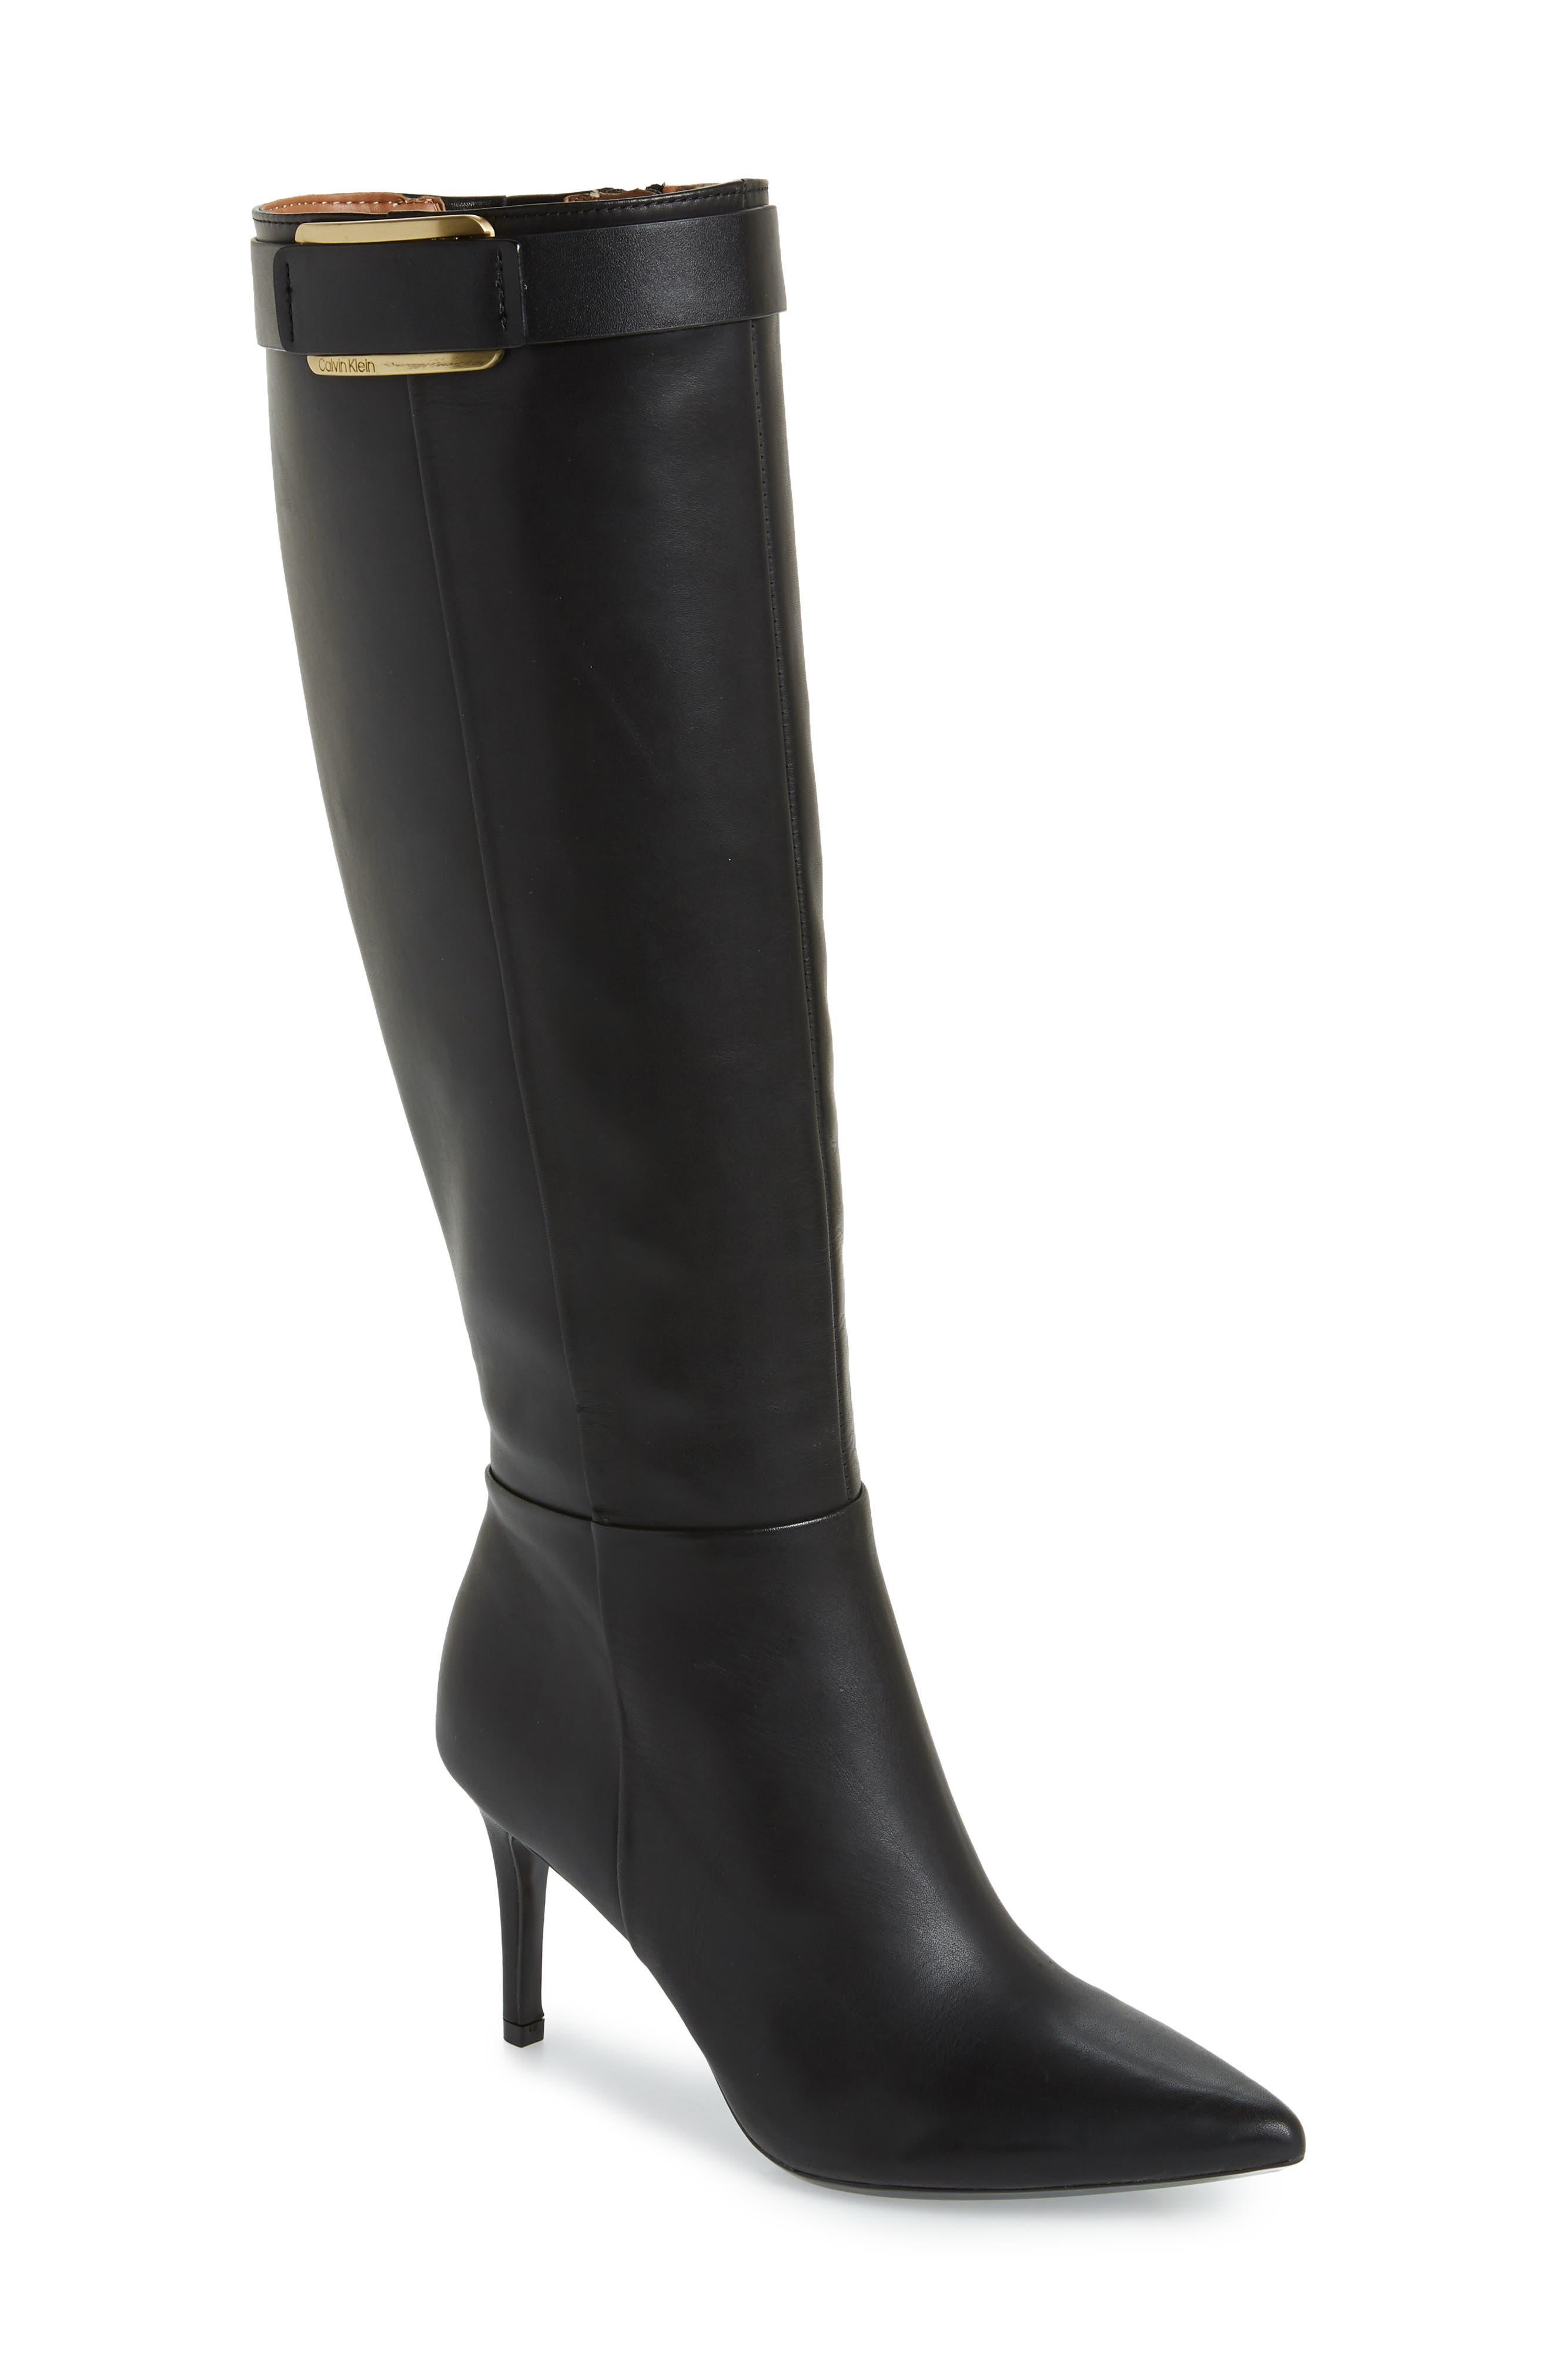 Calvin Klein Glydia Stiletto Knee High Boot Wide Calf- Black